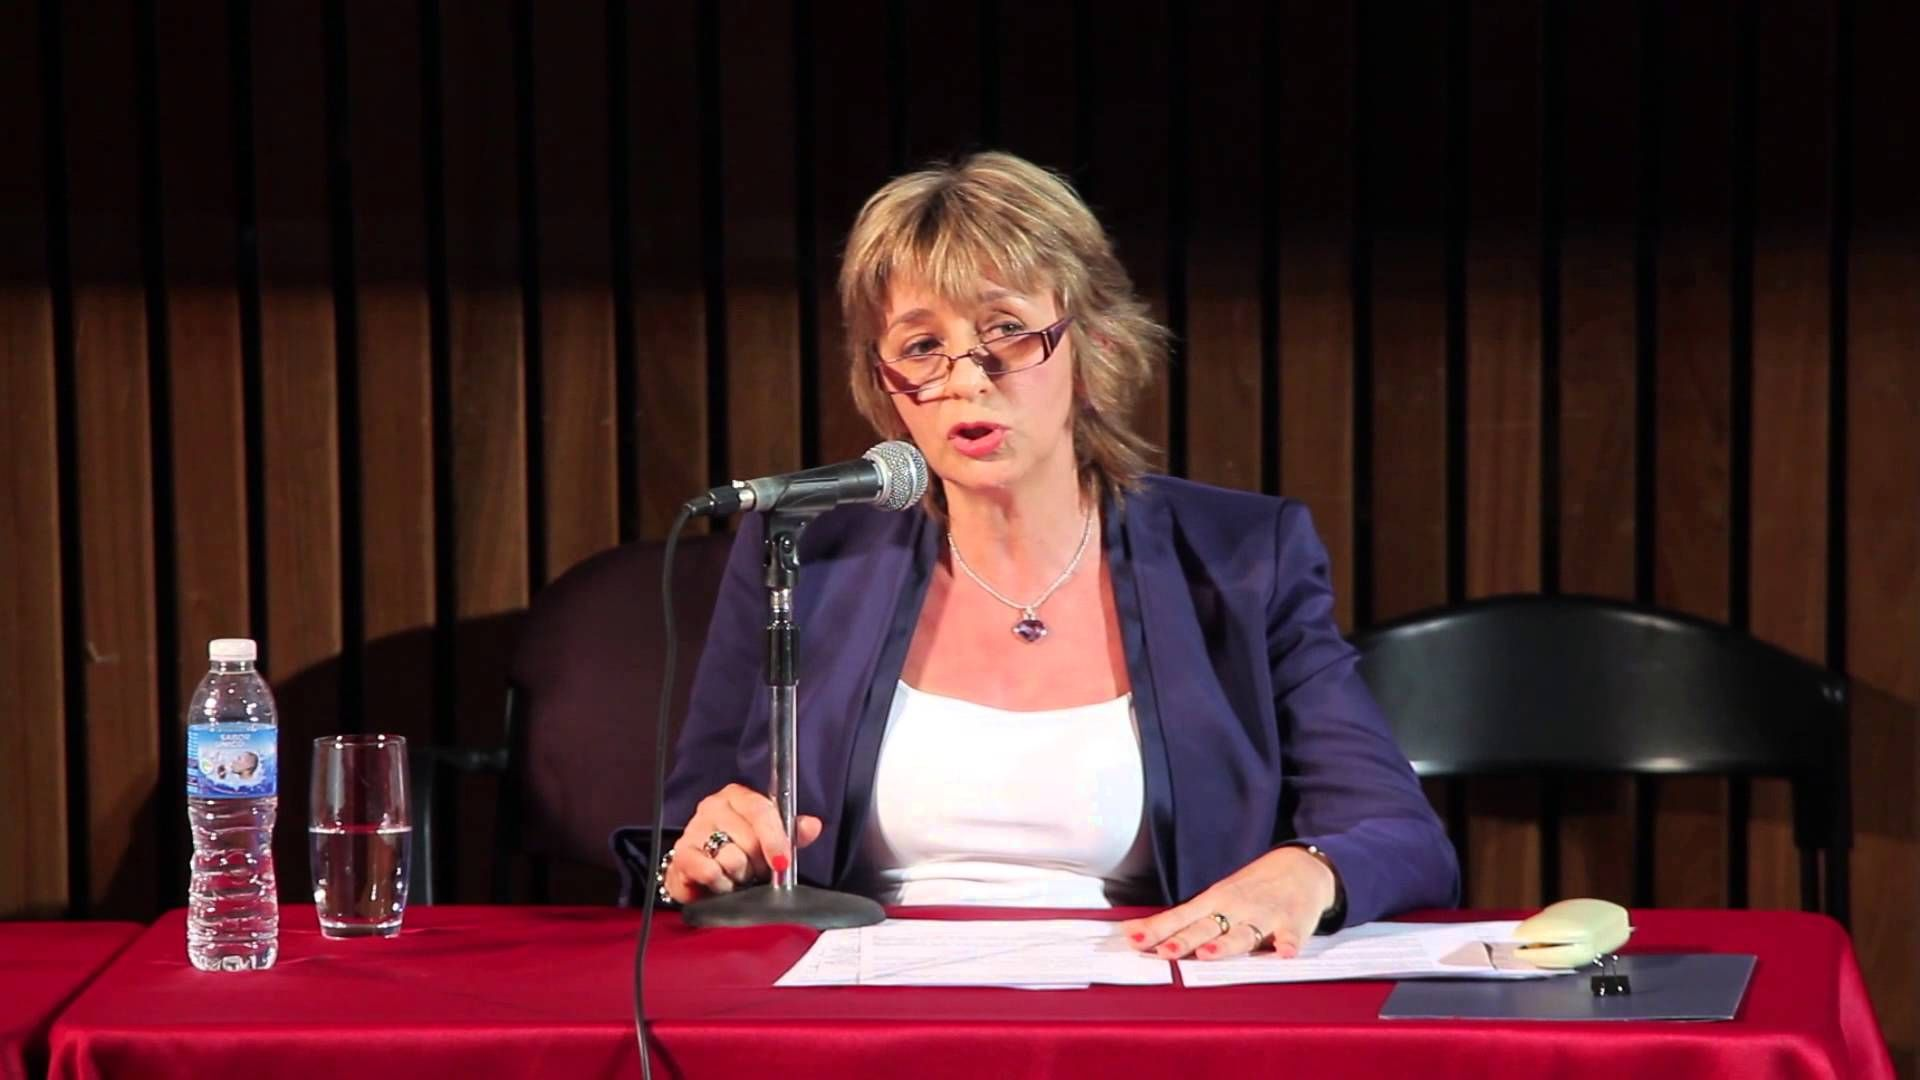 La procuradora Alejandra Gils Carbó desplazó al fiscal Guillermo Marijuán